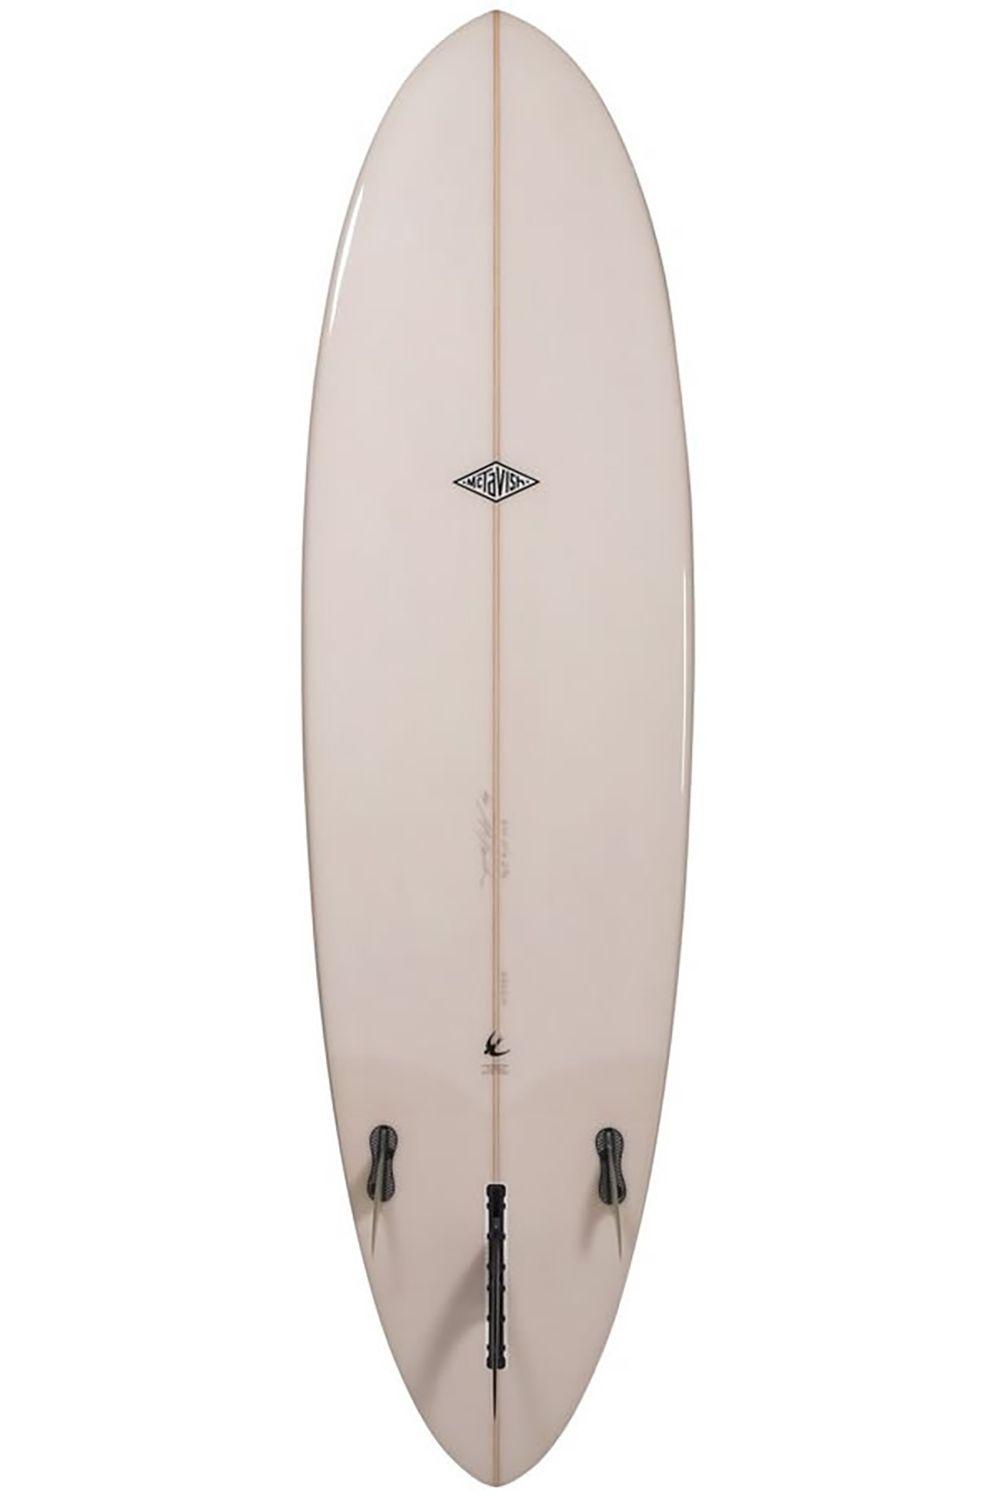 Prancha Surf Mc Tavish SUMO 6'6 Round Pin Tail - Color 1 + 2 FCS II 6ft6